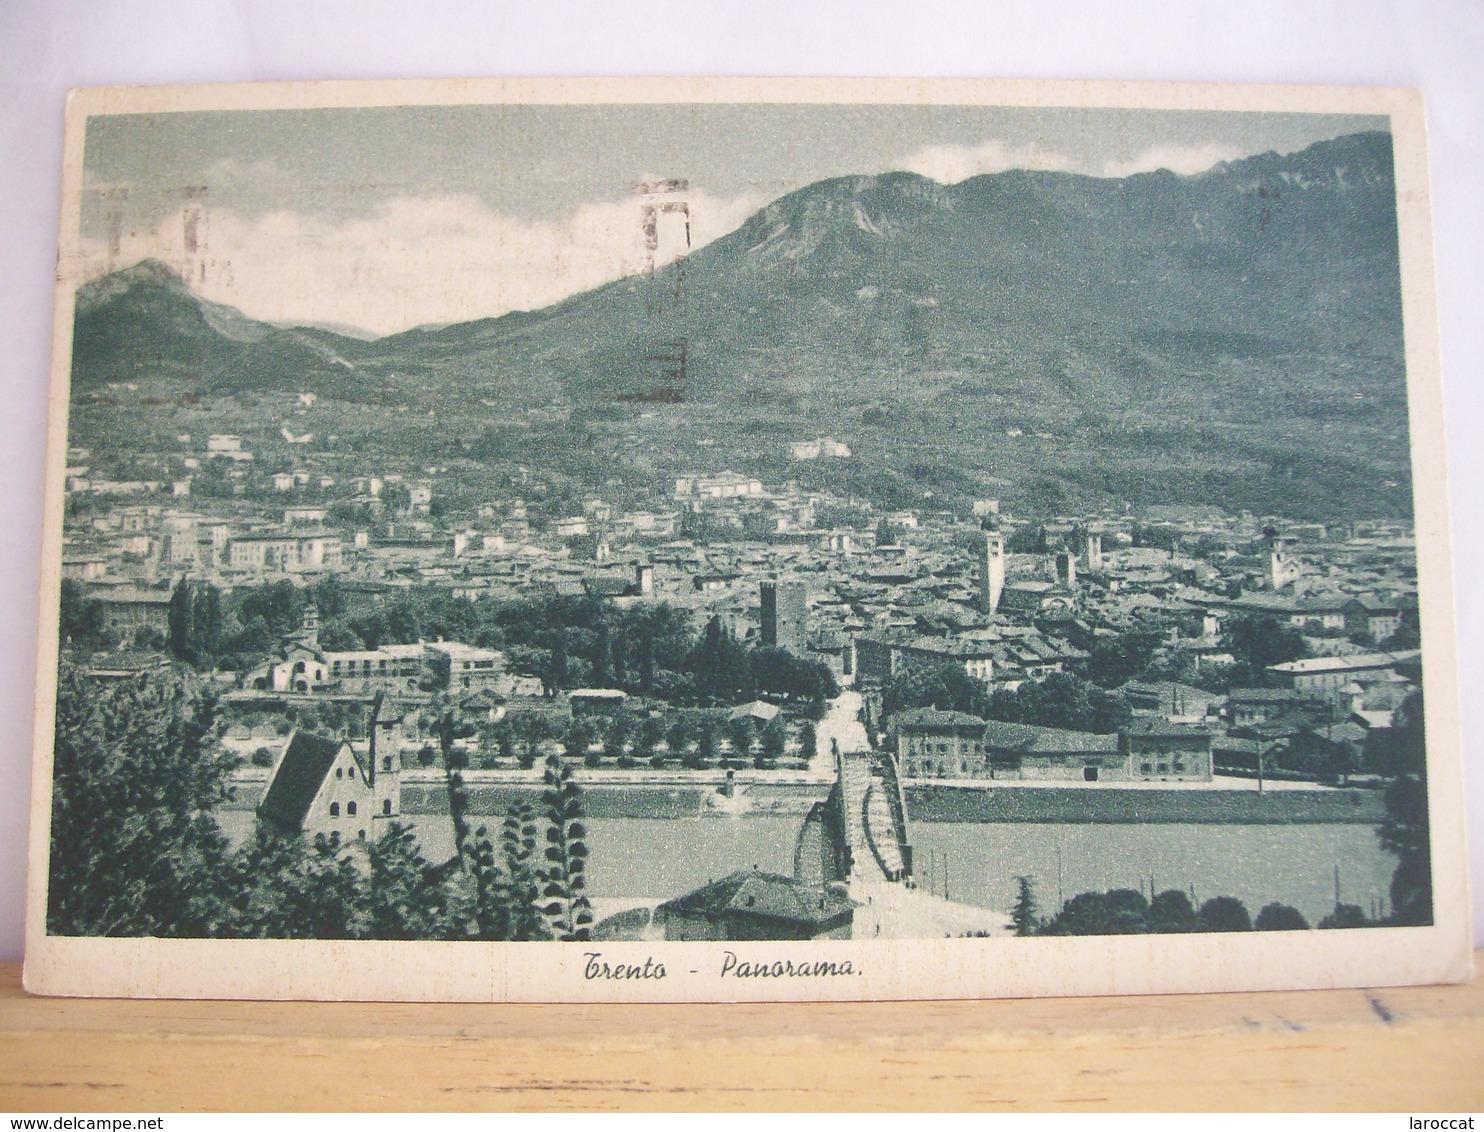 1937 - Trento - Panorama - Ponte - Timbro A Cassetta - 1 Francobollo Da 20 Cent. Caio Cesare - Trento